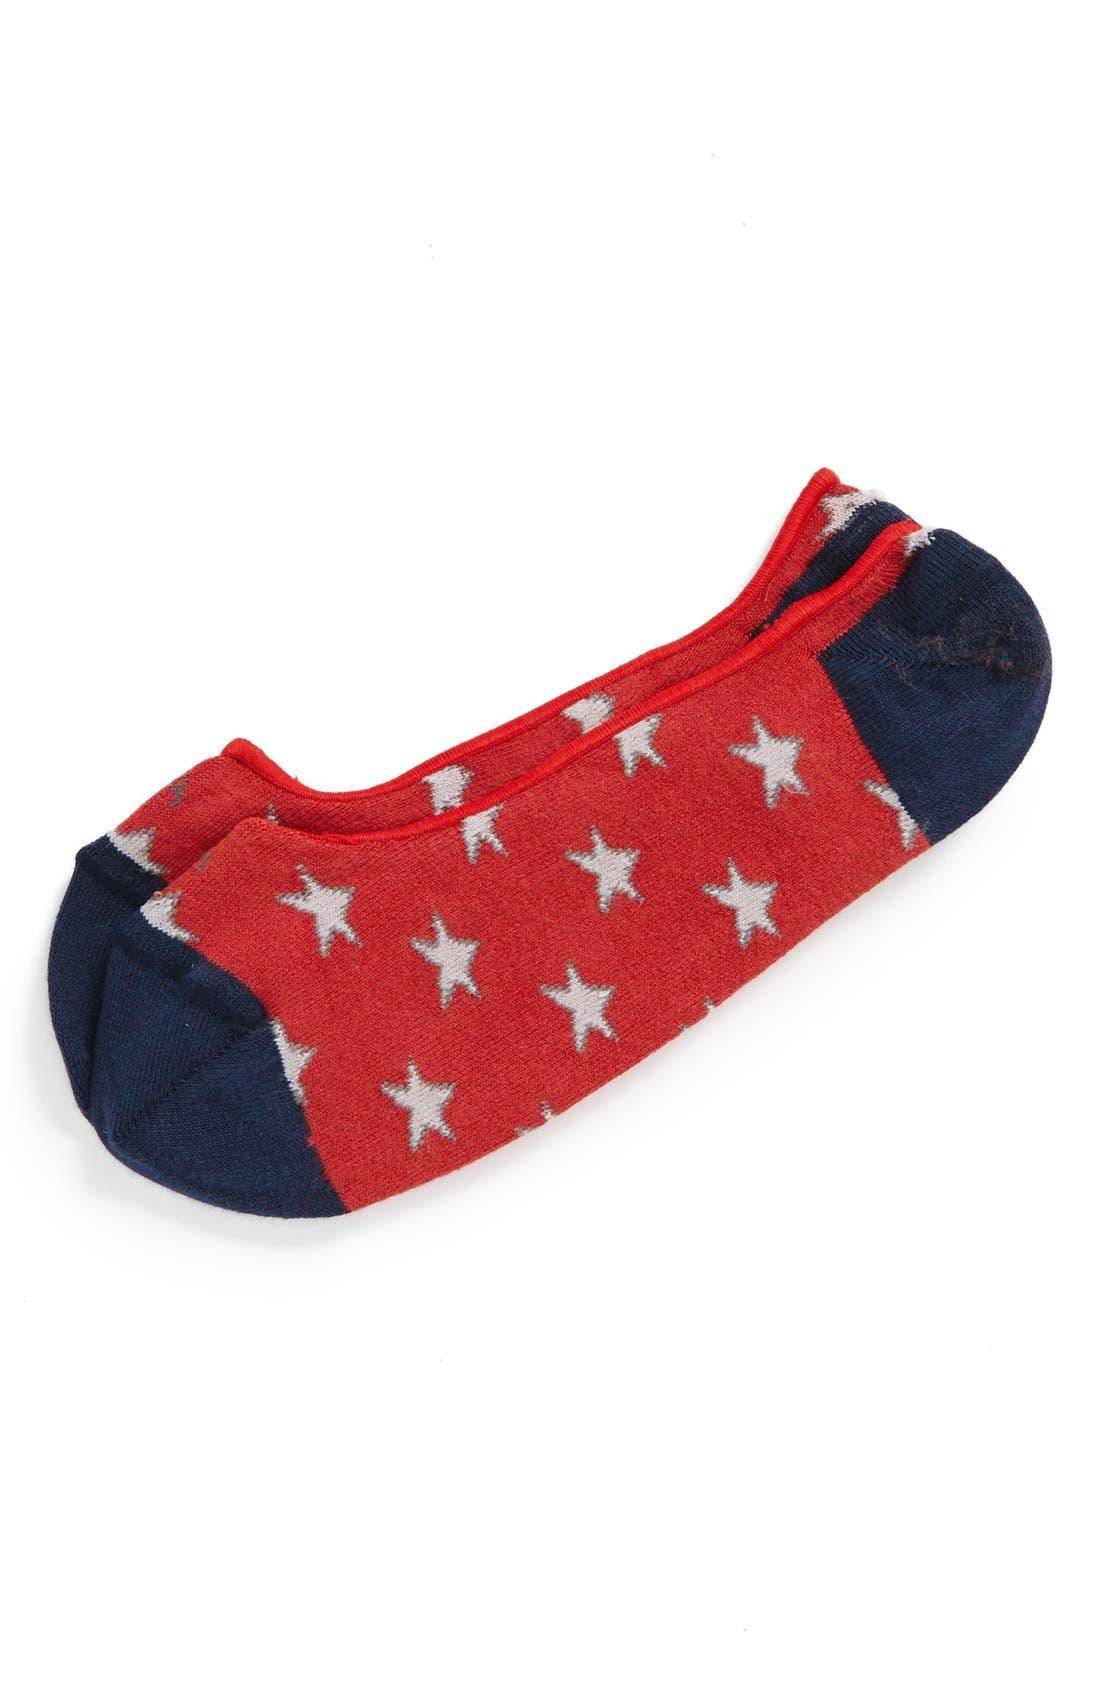 Main Image - hook + ALBERT 'Stars and Stripes' No-Show Socks